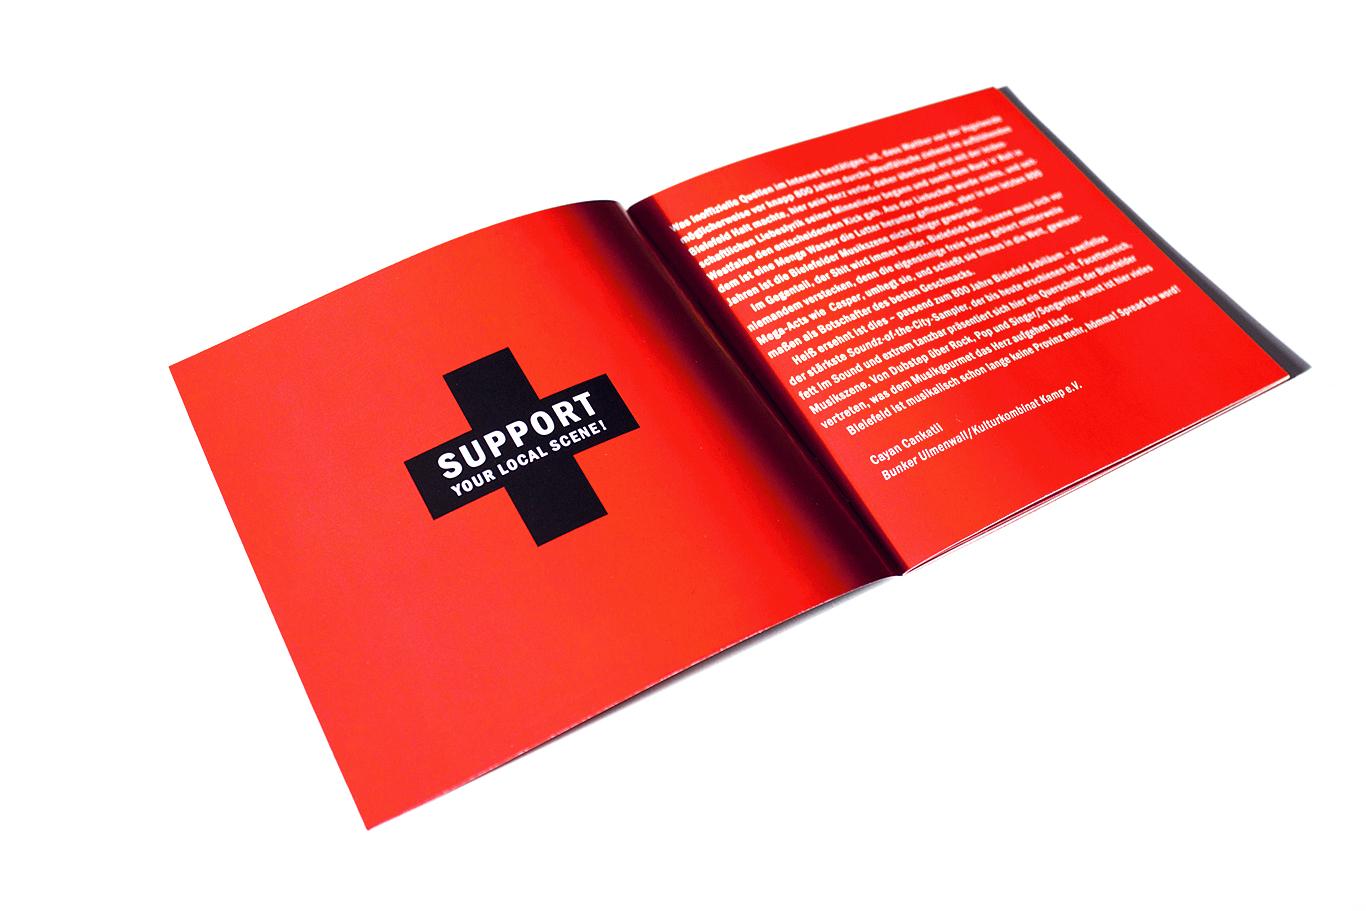 cd_sotc_2014_booklet01